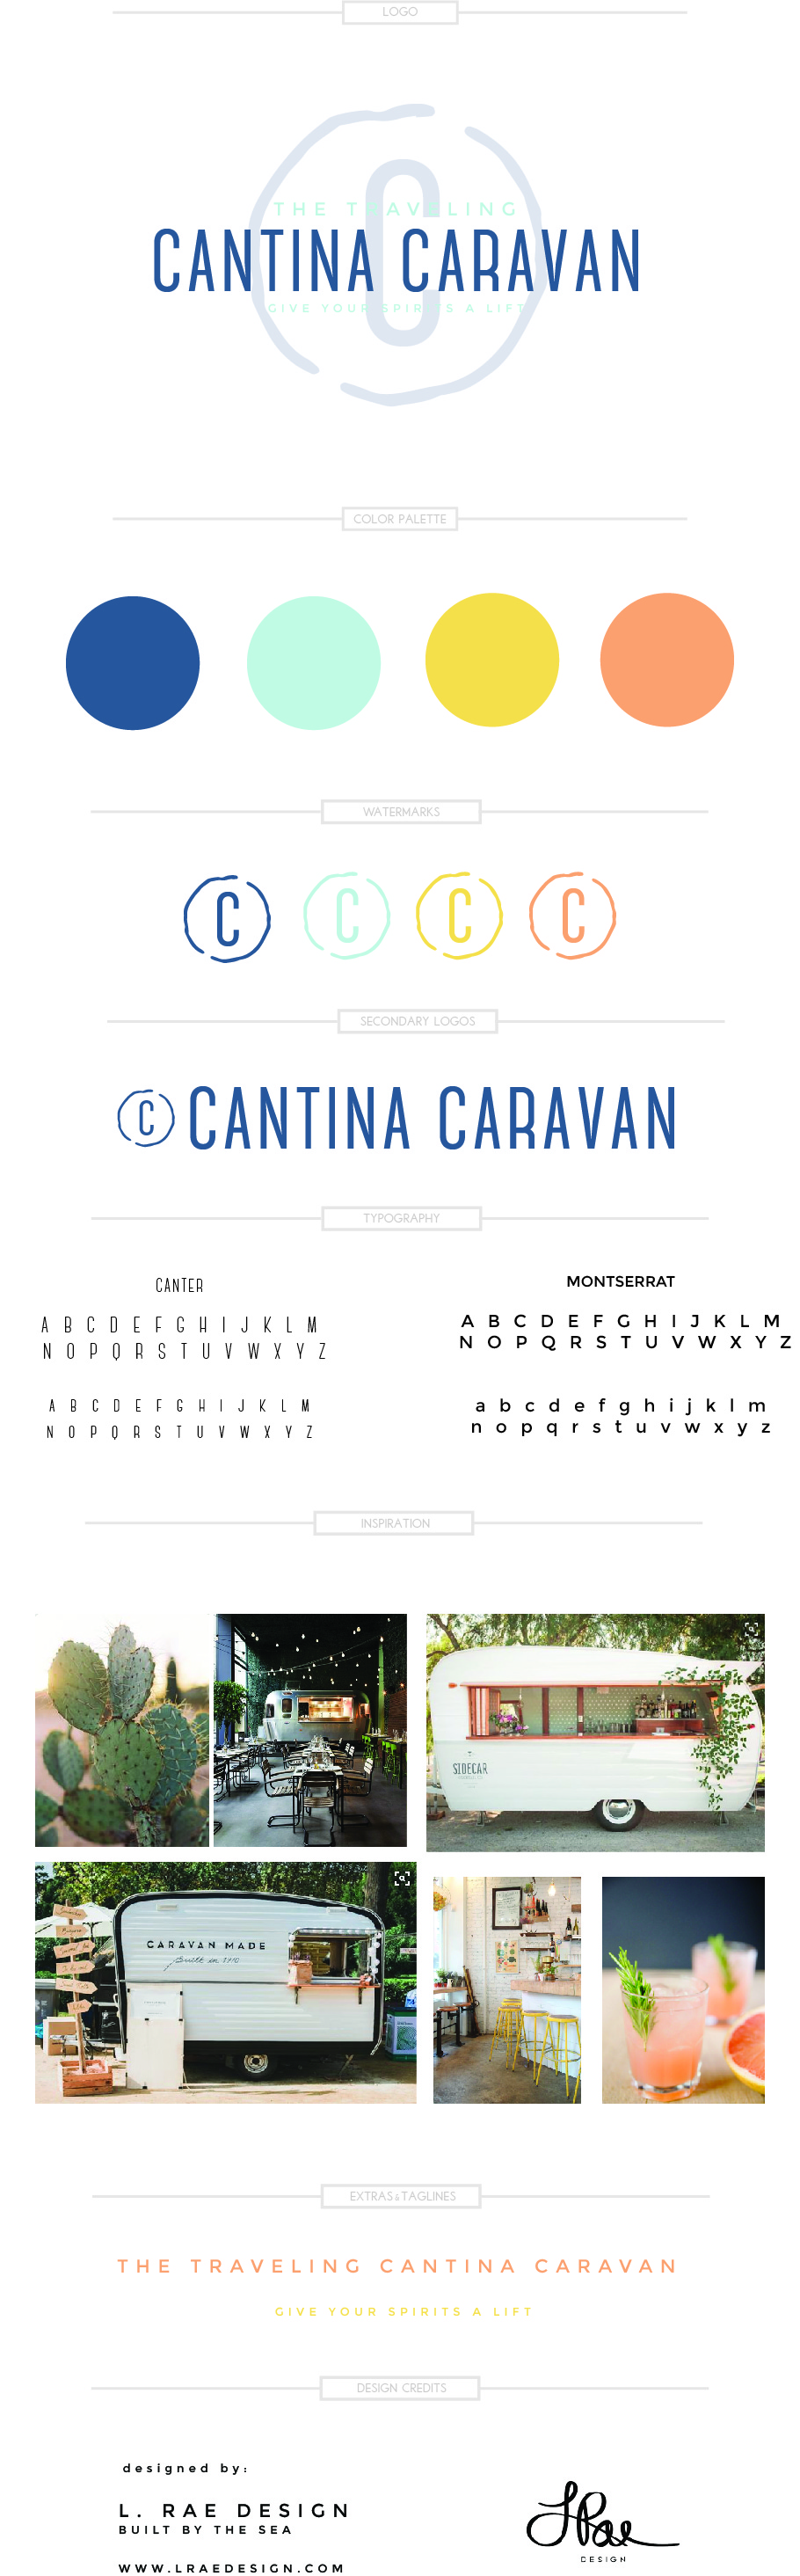 Cantina Caravan Branding